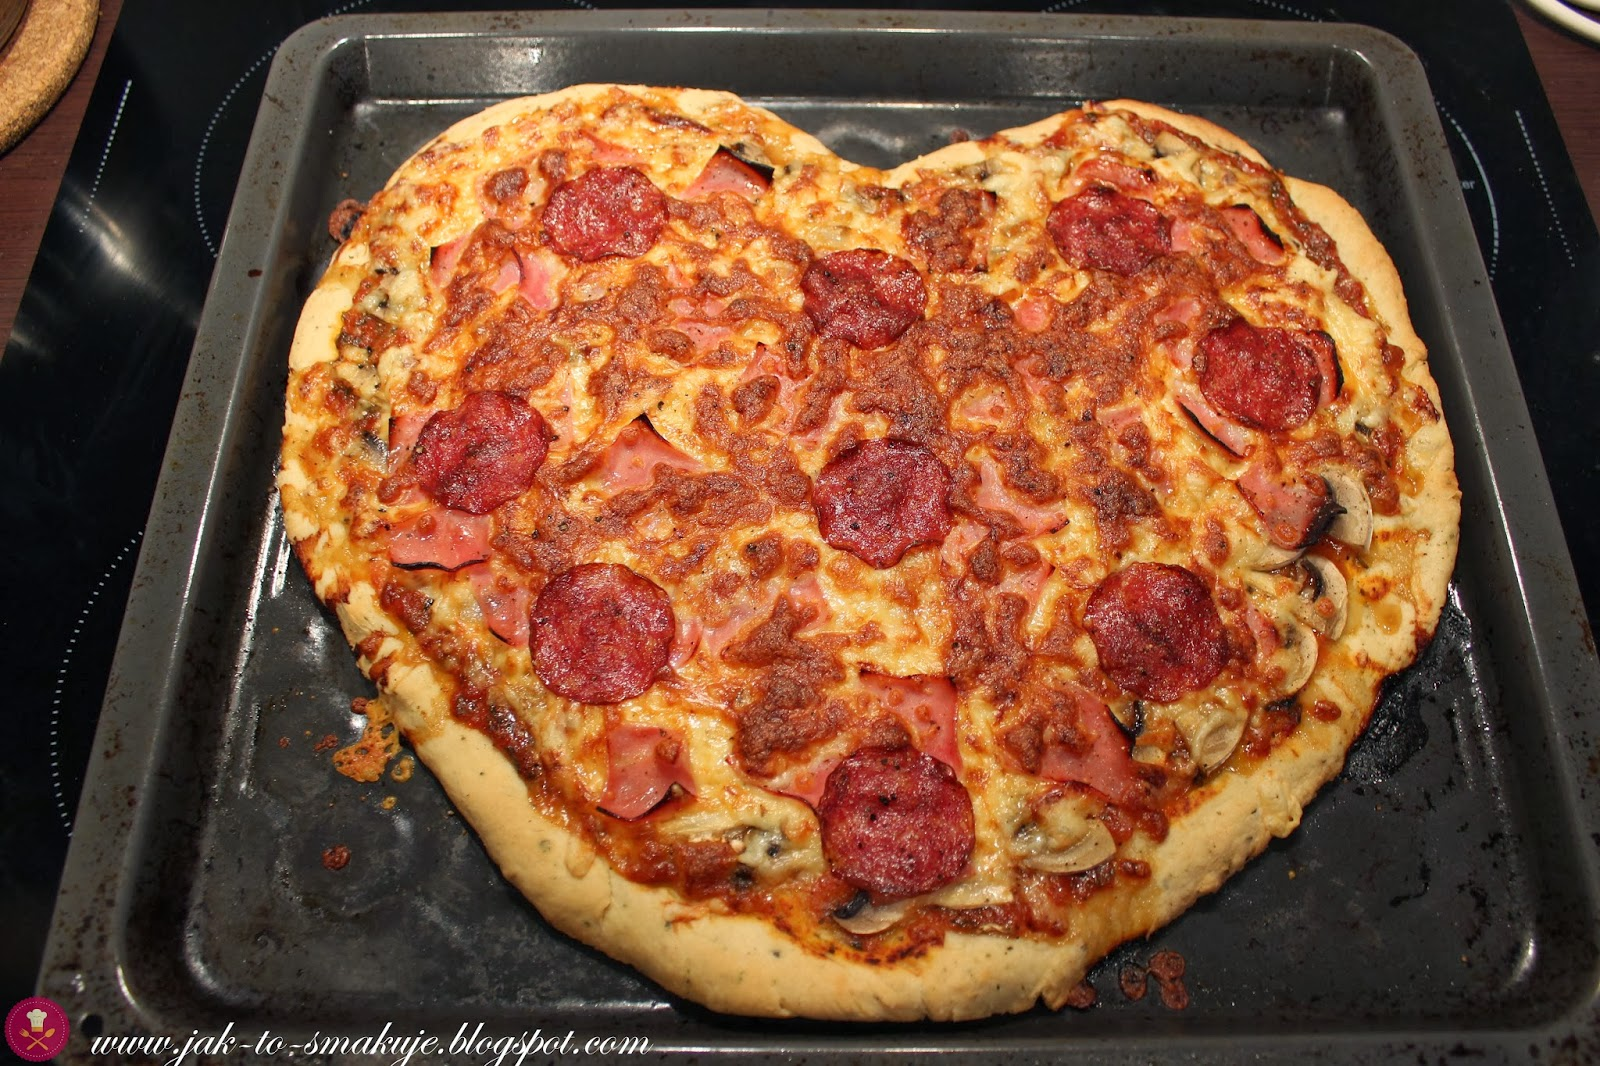 "<img alt=""Pizza od serca"" src=""Pizza od serca.jpg"" />"